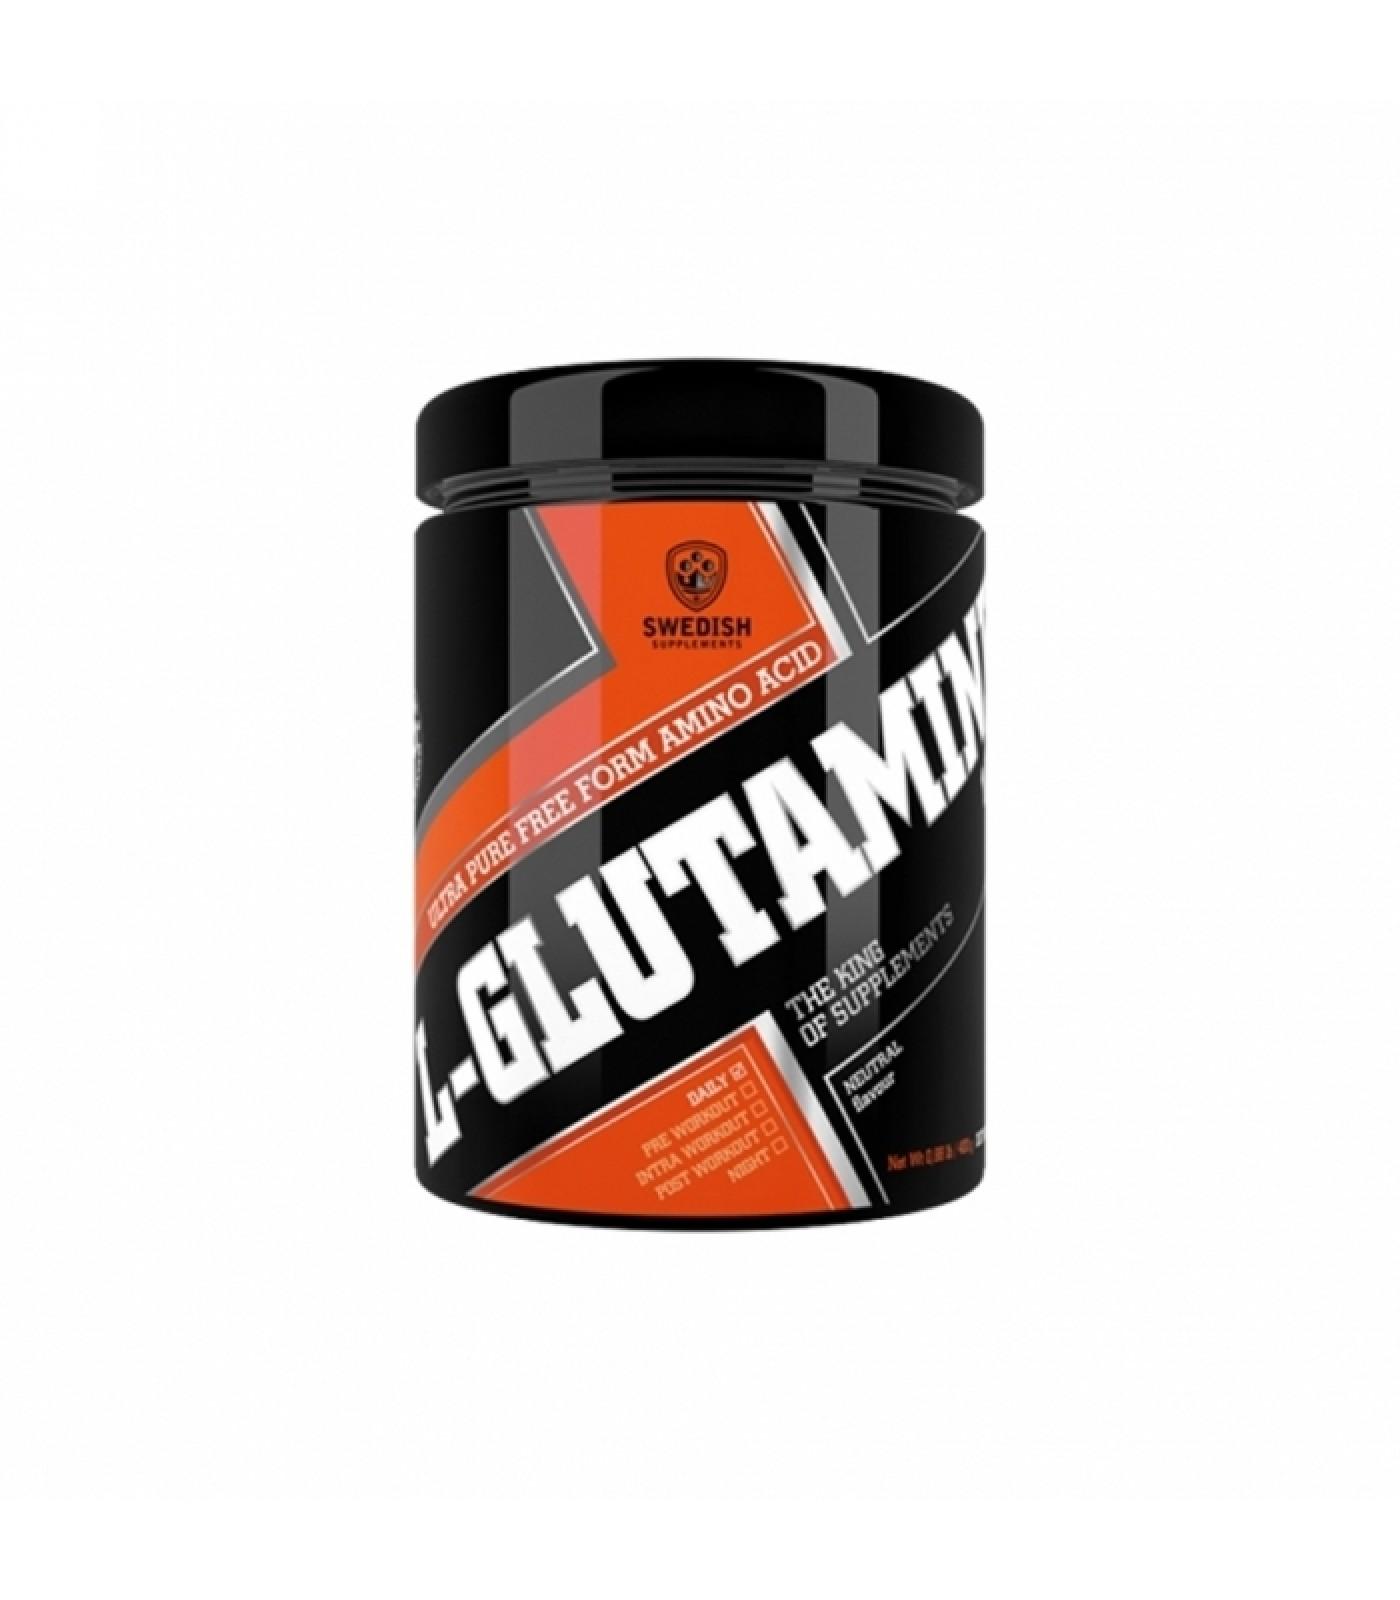 SWEDISH Supplements - L-Glutamine 100%